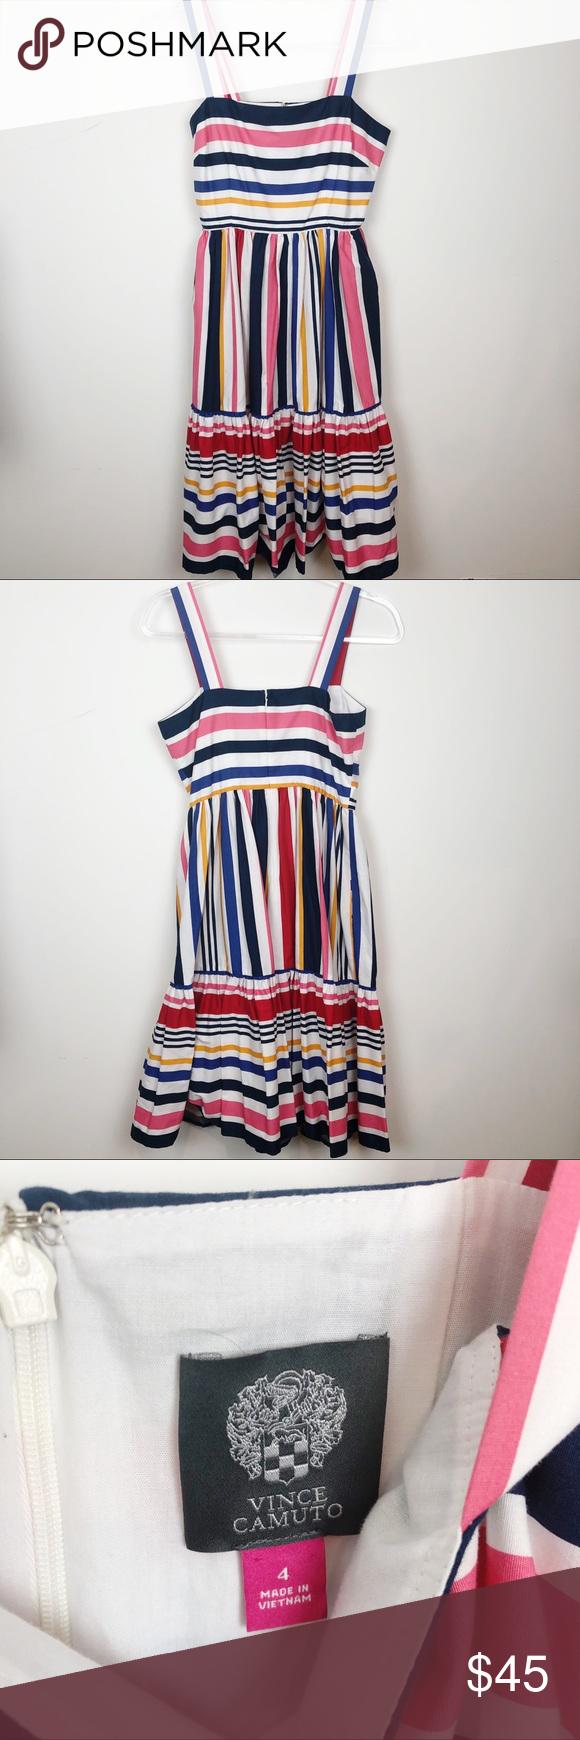 Vince Camuto Color Stripe Sleeveless Dress Sz 4 Vince Camuto Pink White Blue Yellow Multi Stripe Sleeveless Dress Striped Sleeveless Dress Color Stripes Stripe [ 1740 x 580 Pixel ]